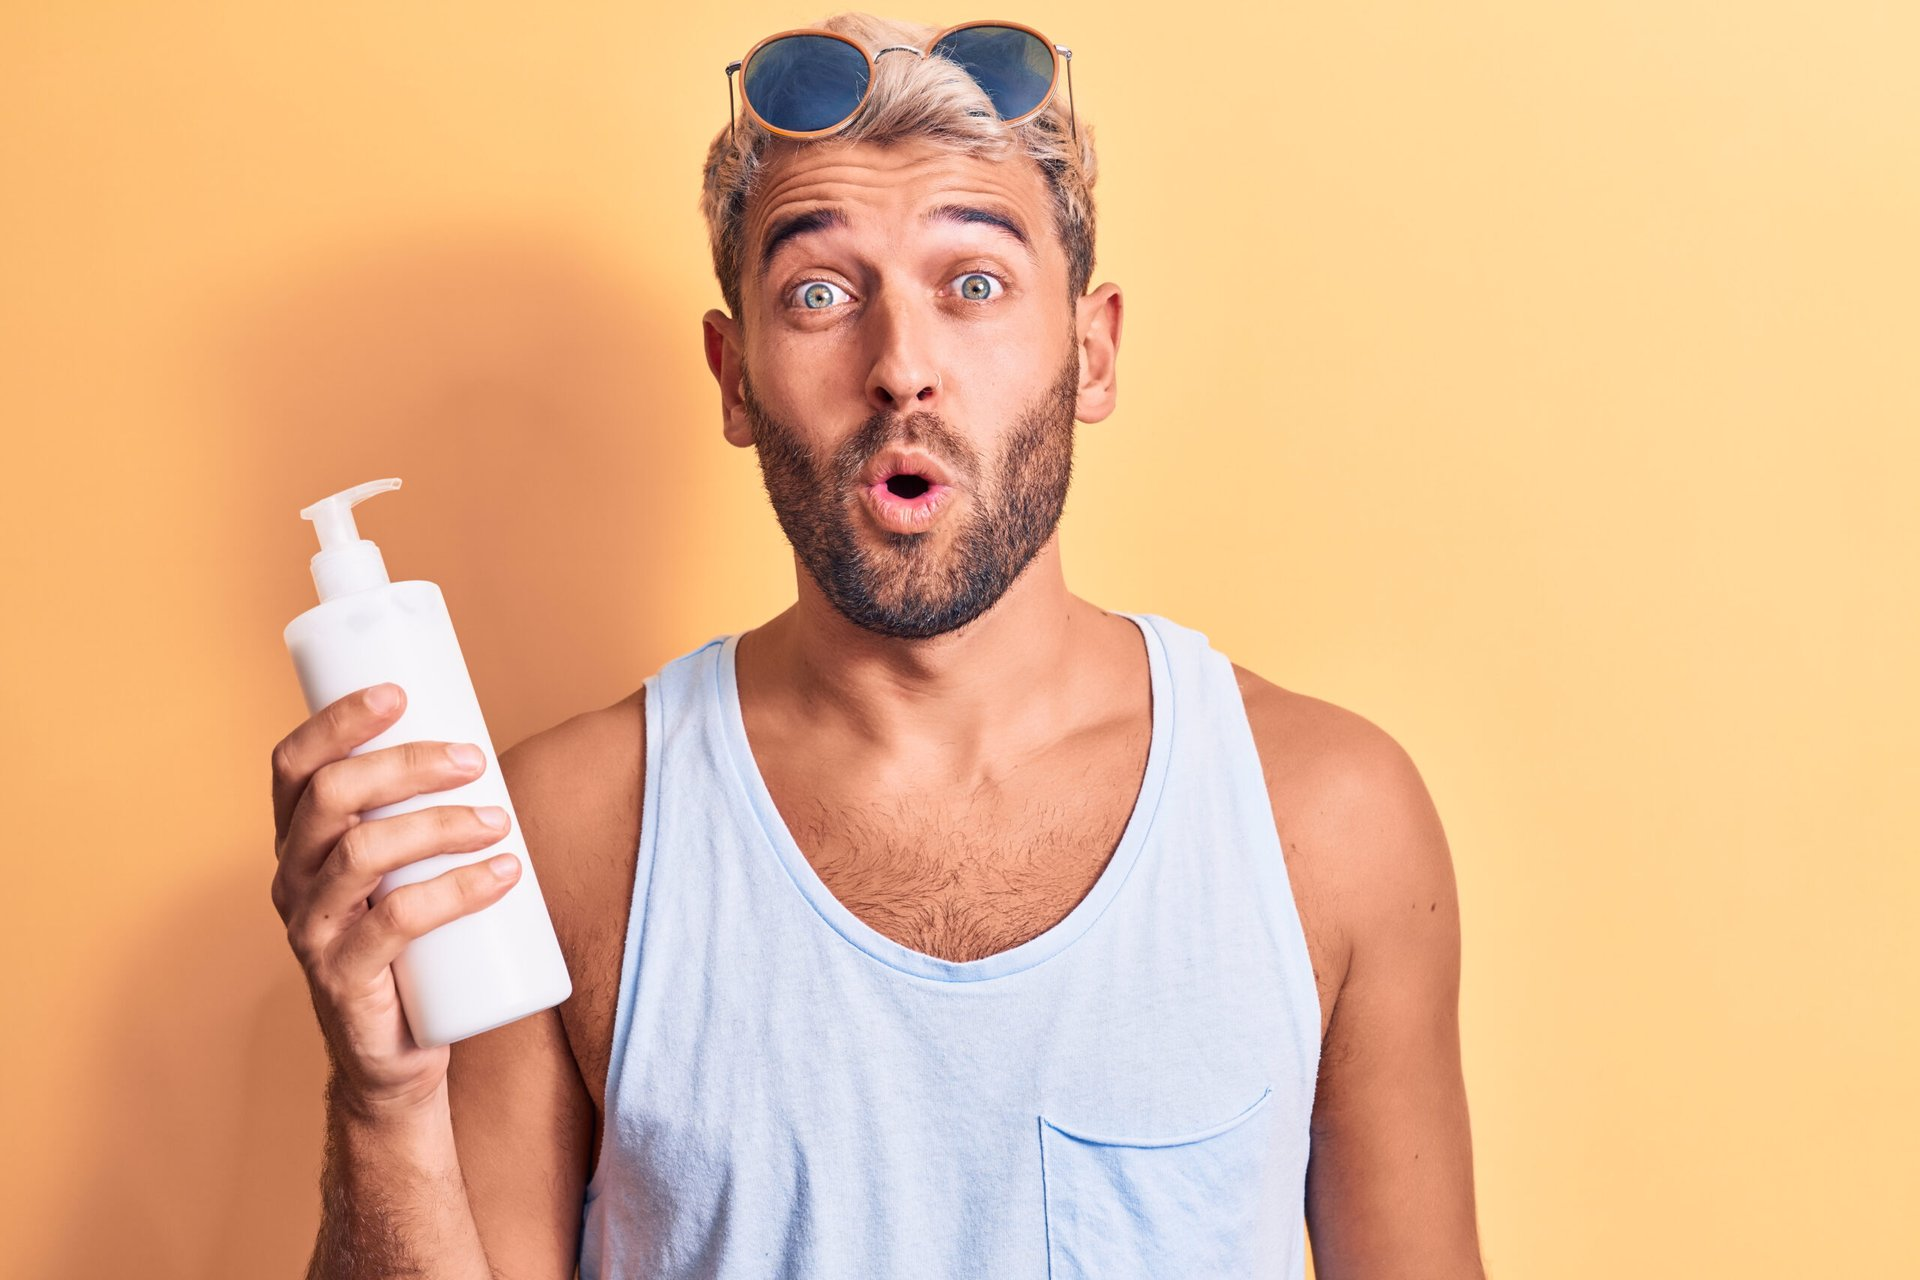 Man holding a bottle of sunscreen